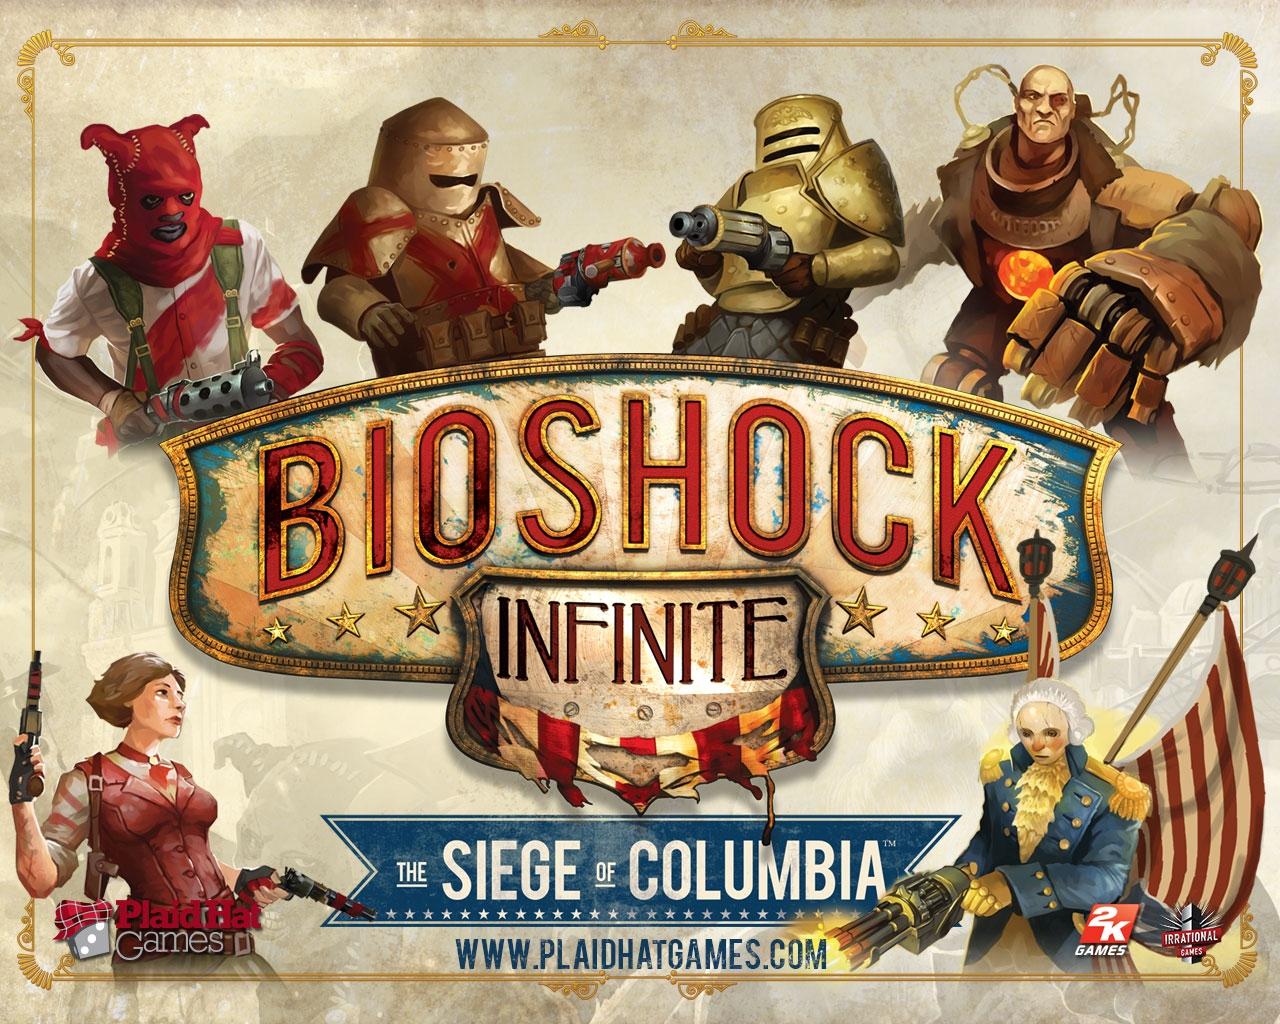 BioShock Infinite- The Siege of Columbia